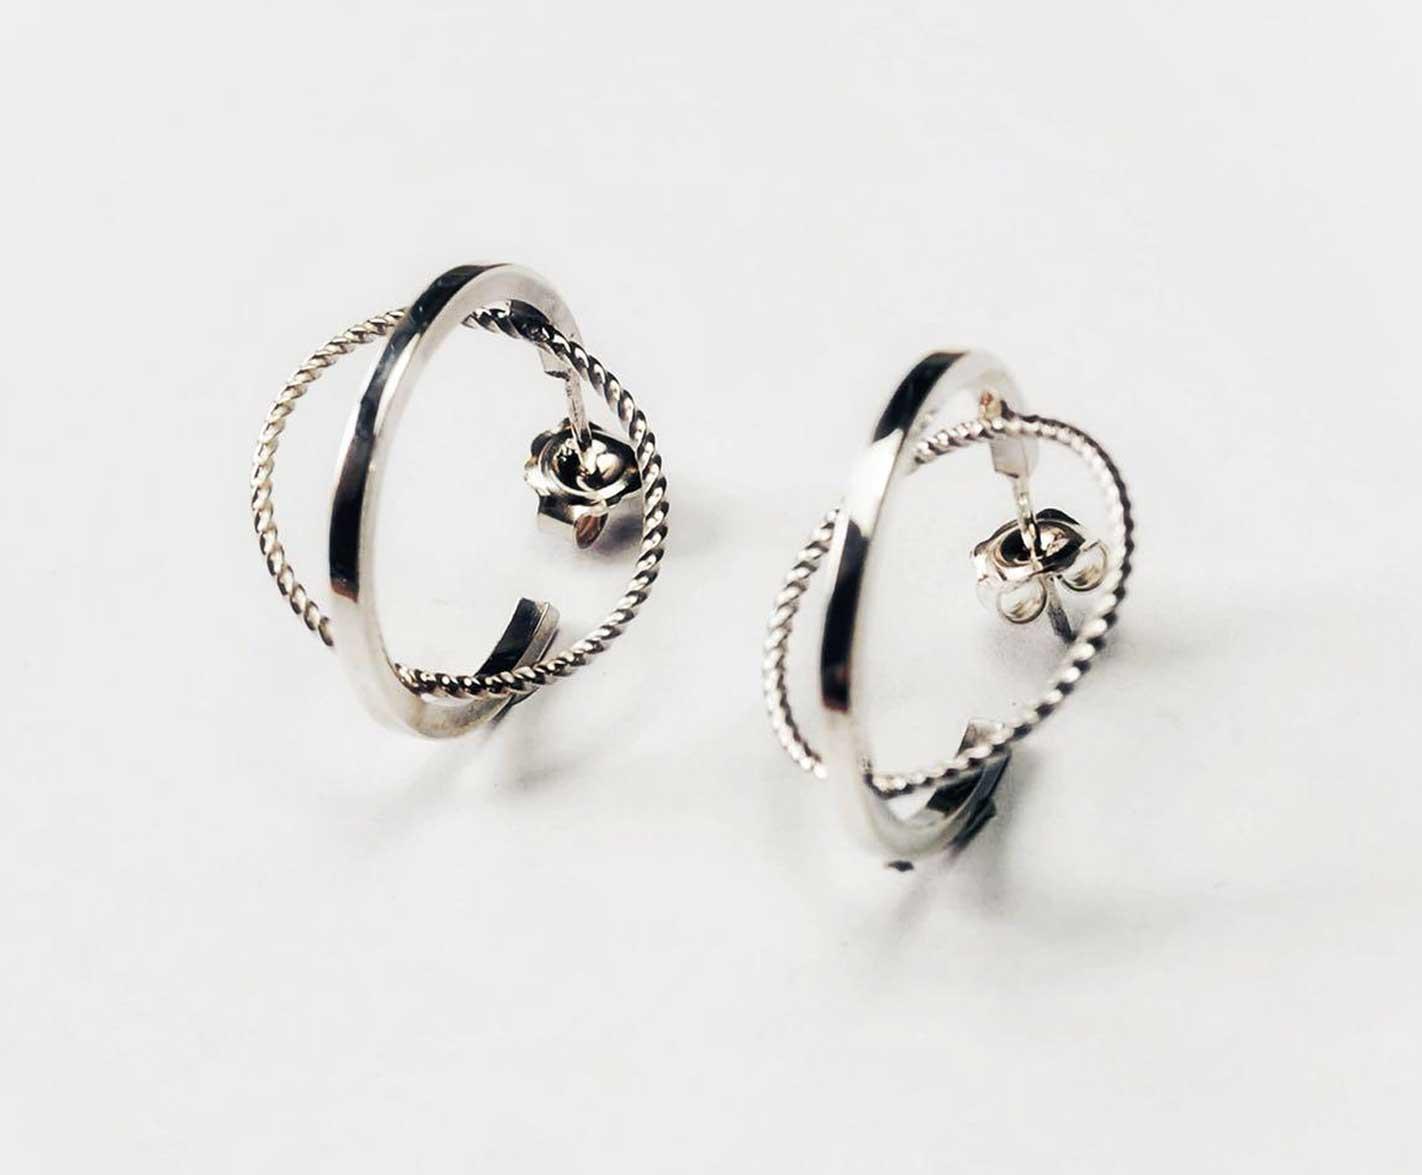 Elliptical Stud Earrings